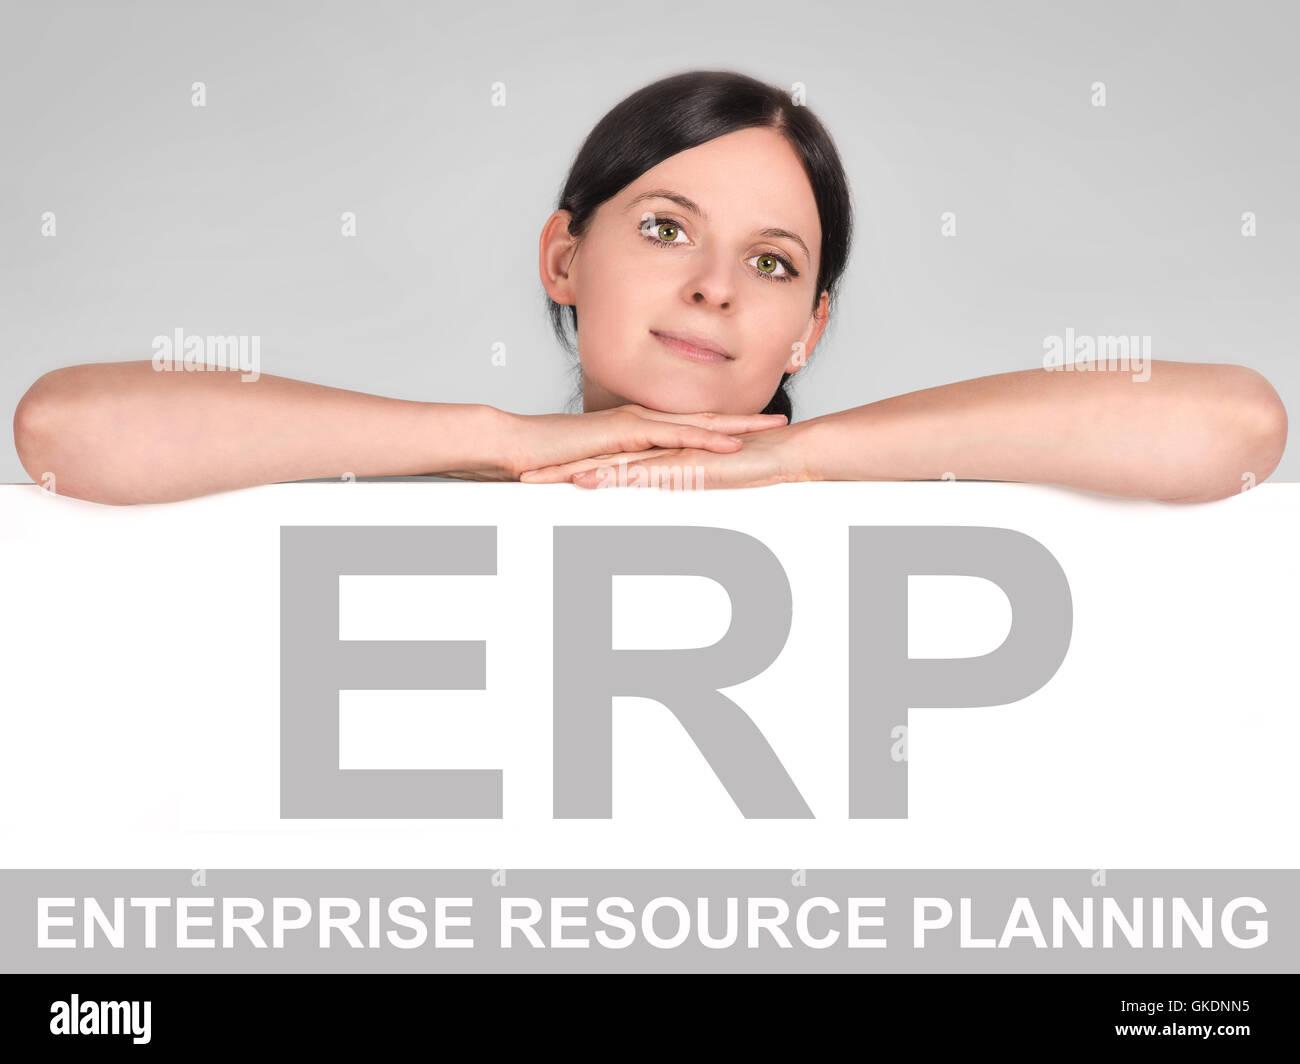 management integration control - Stock Image